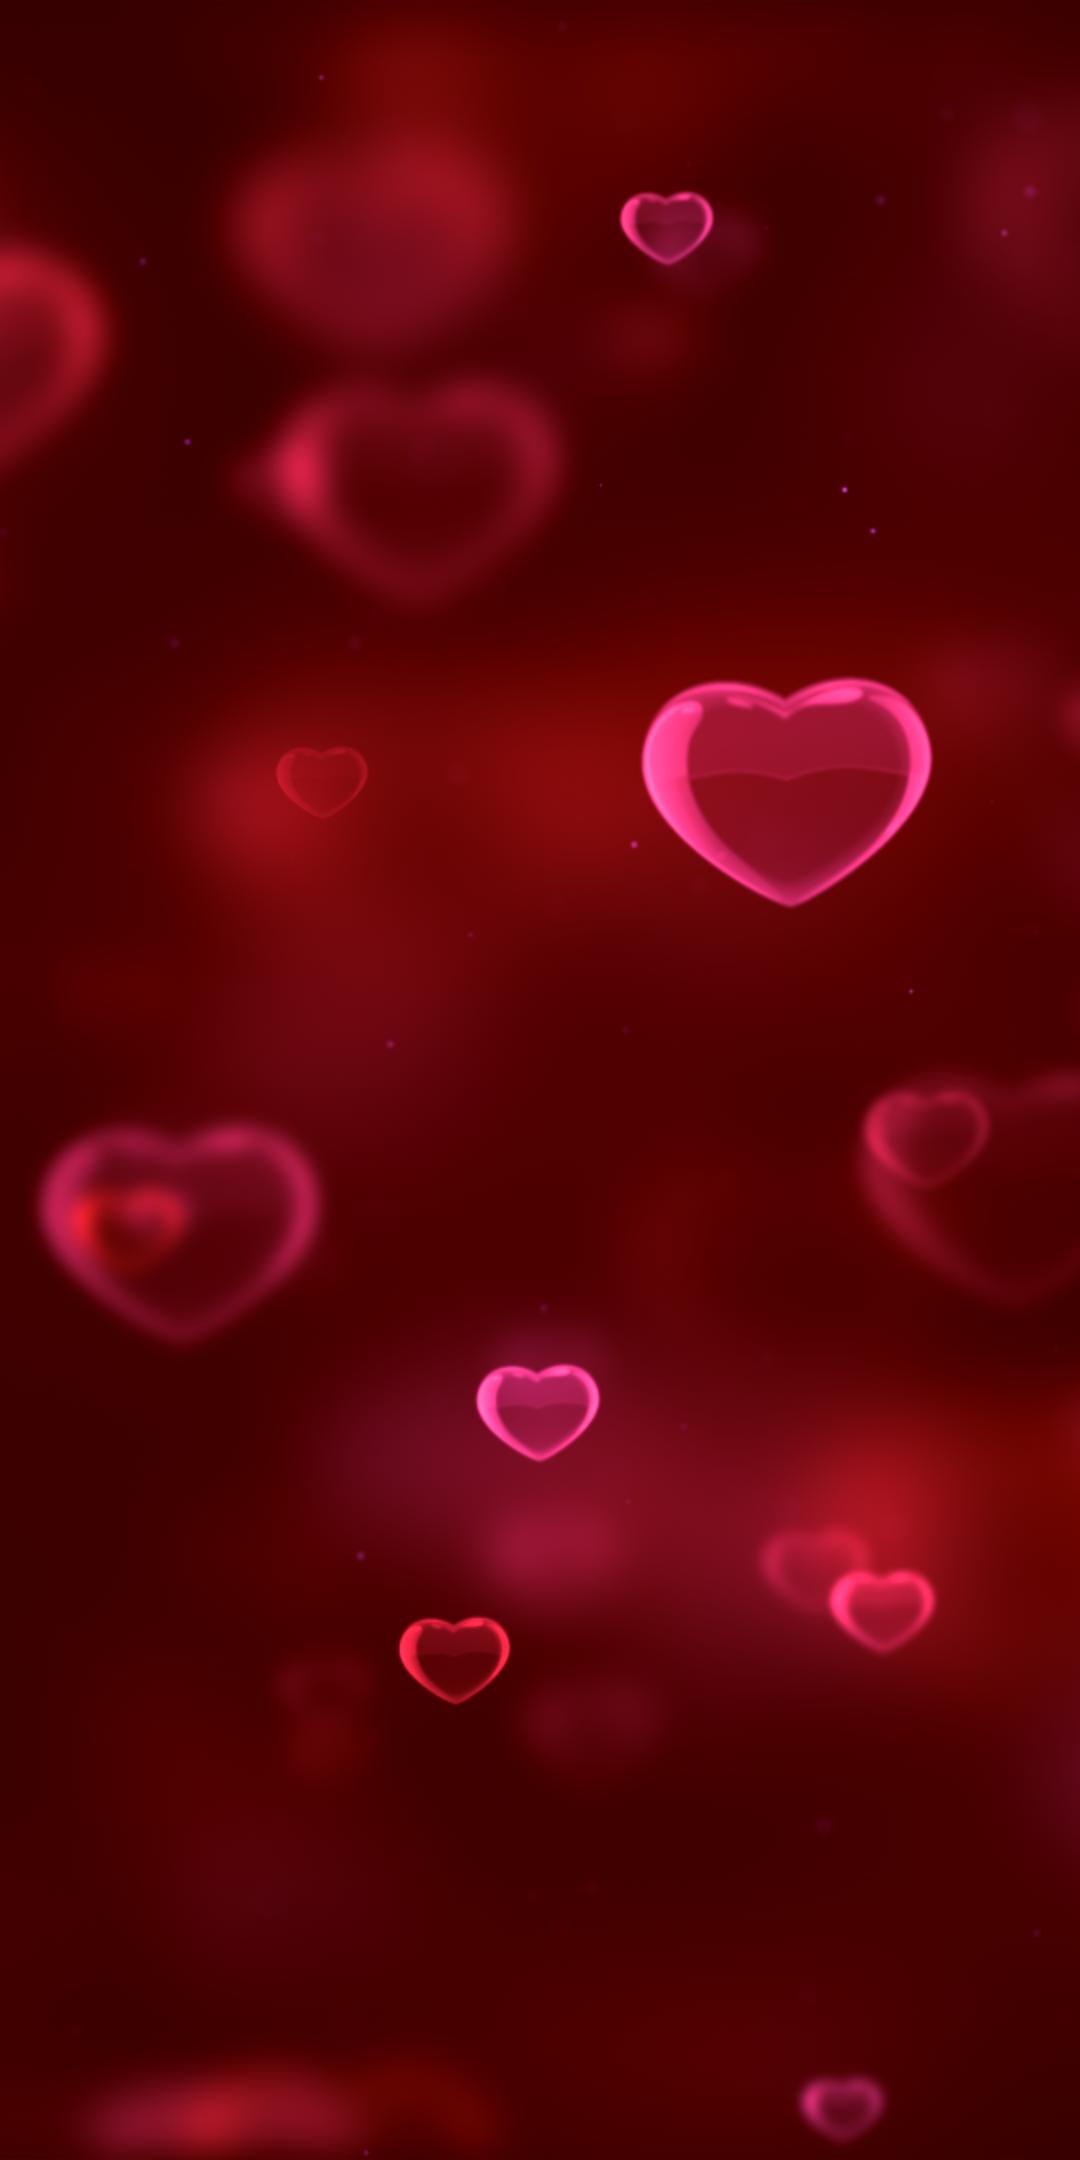 Love Red Hearts Girly Pink Blur 1080x2160 Wallpaper Love Wallpaper Backgrounds Pink Wallpaper Iphone Valentines Wallpaper